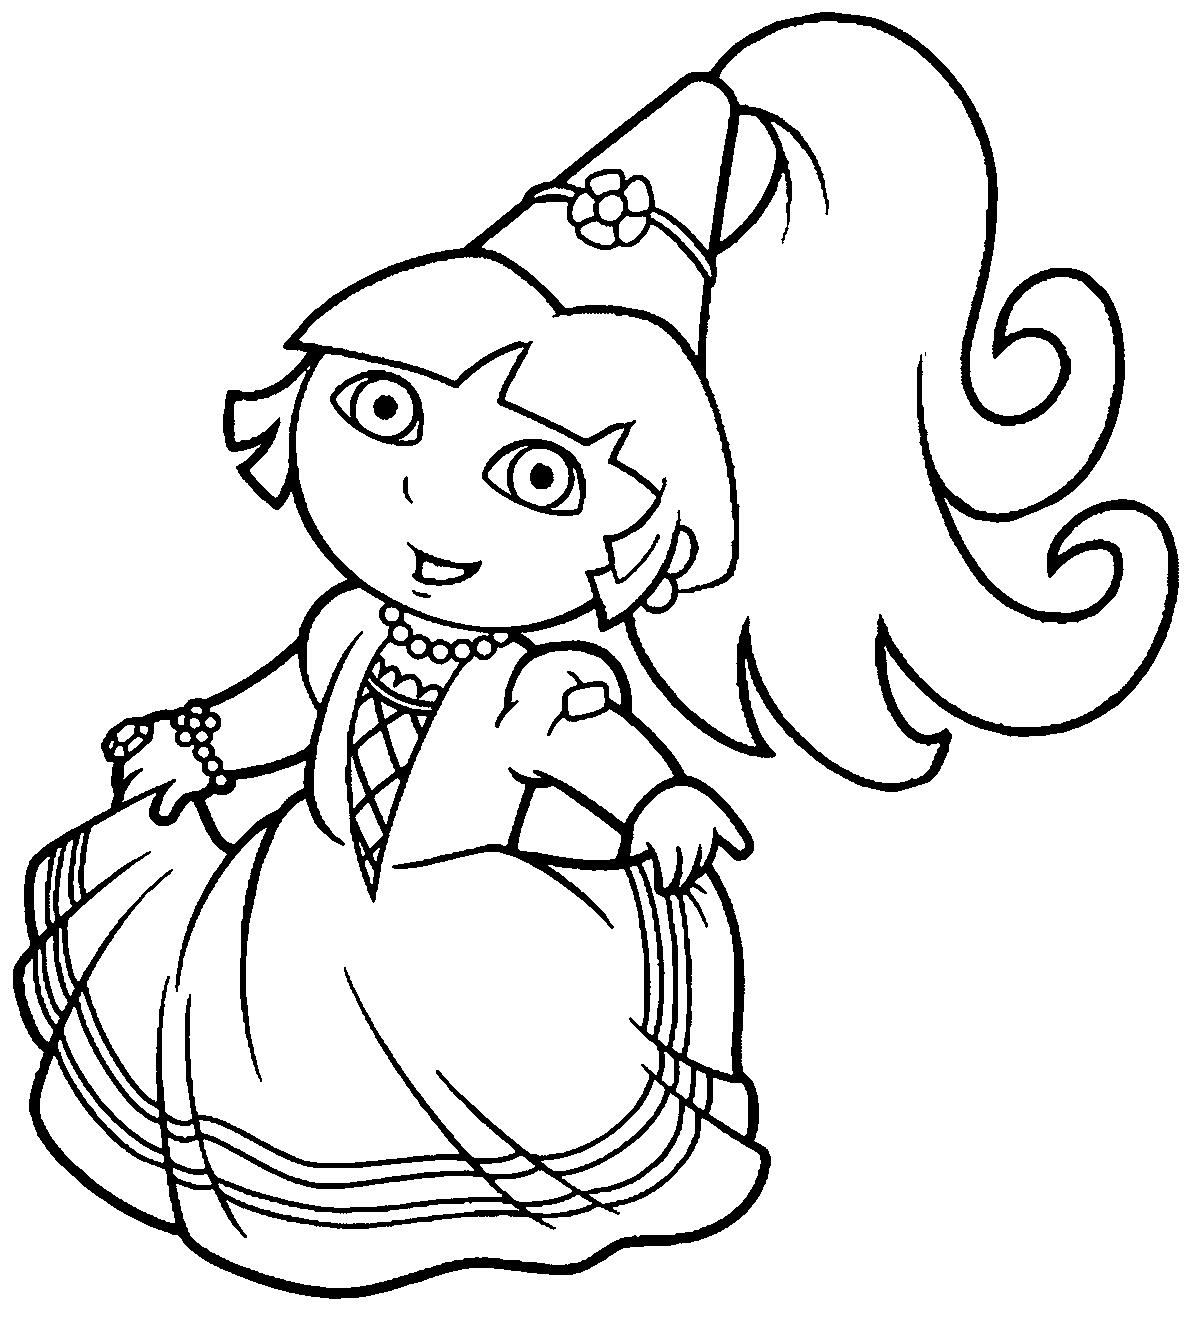 Brinquedos de Papel: Princesa Dora - Desenhos para colorir